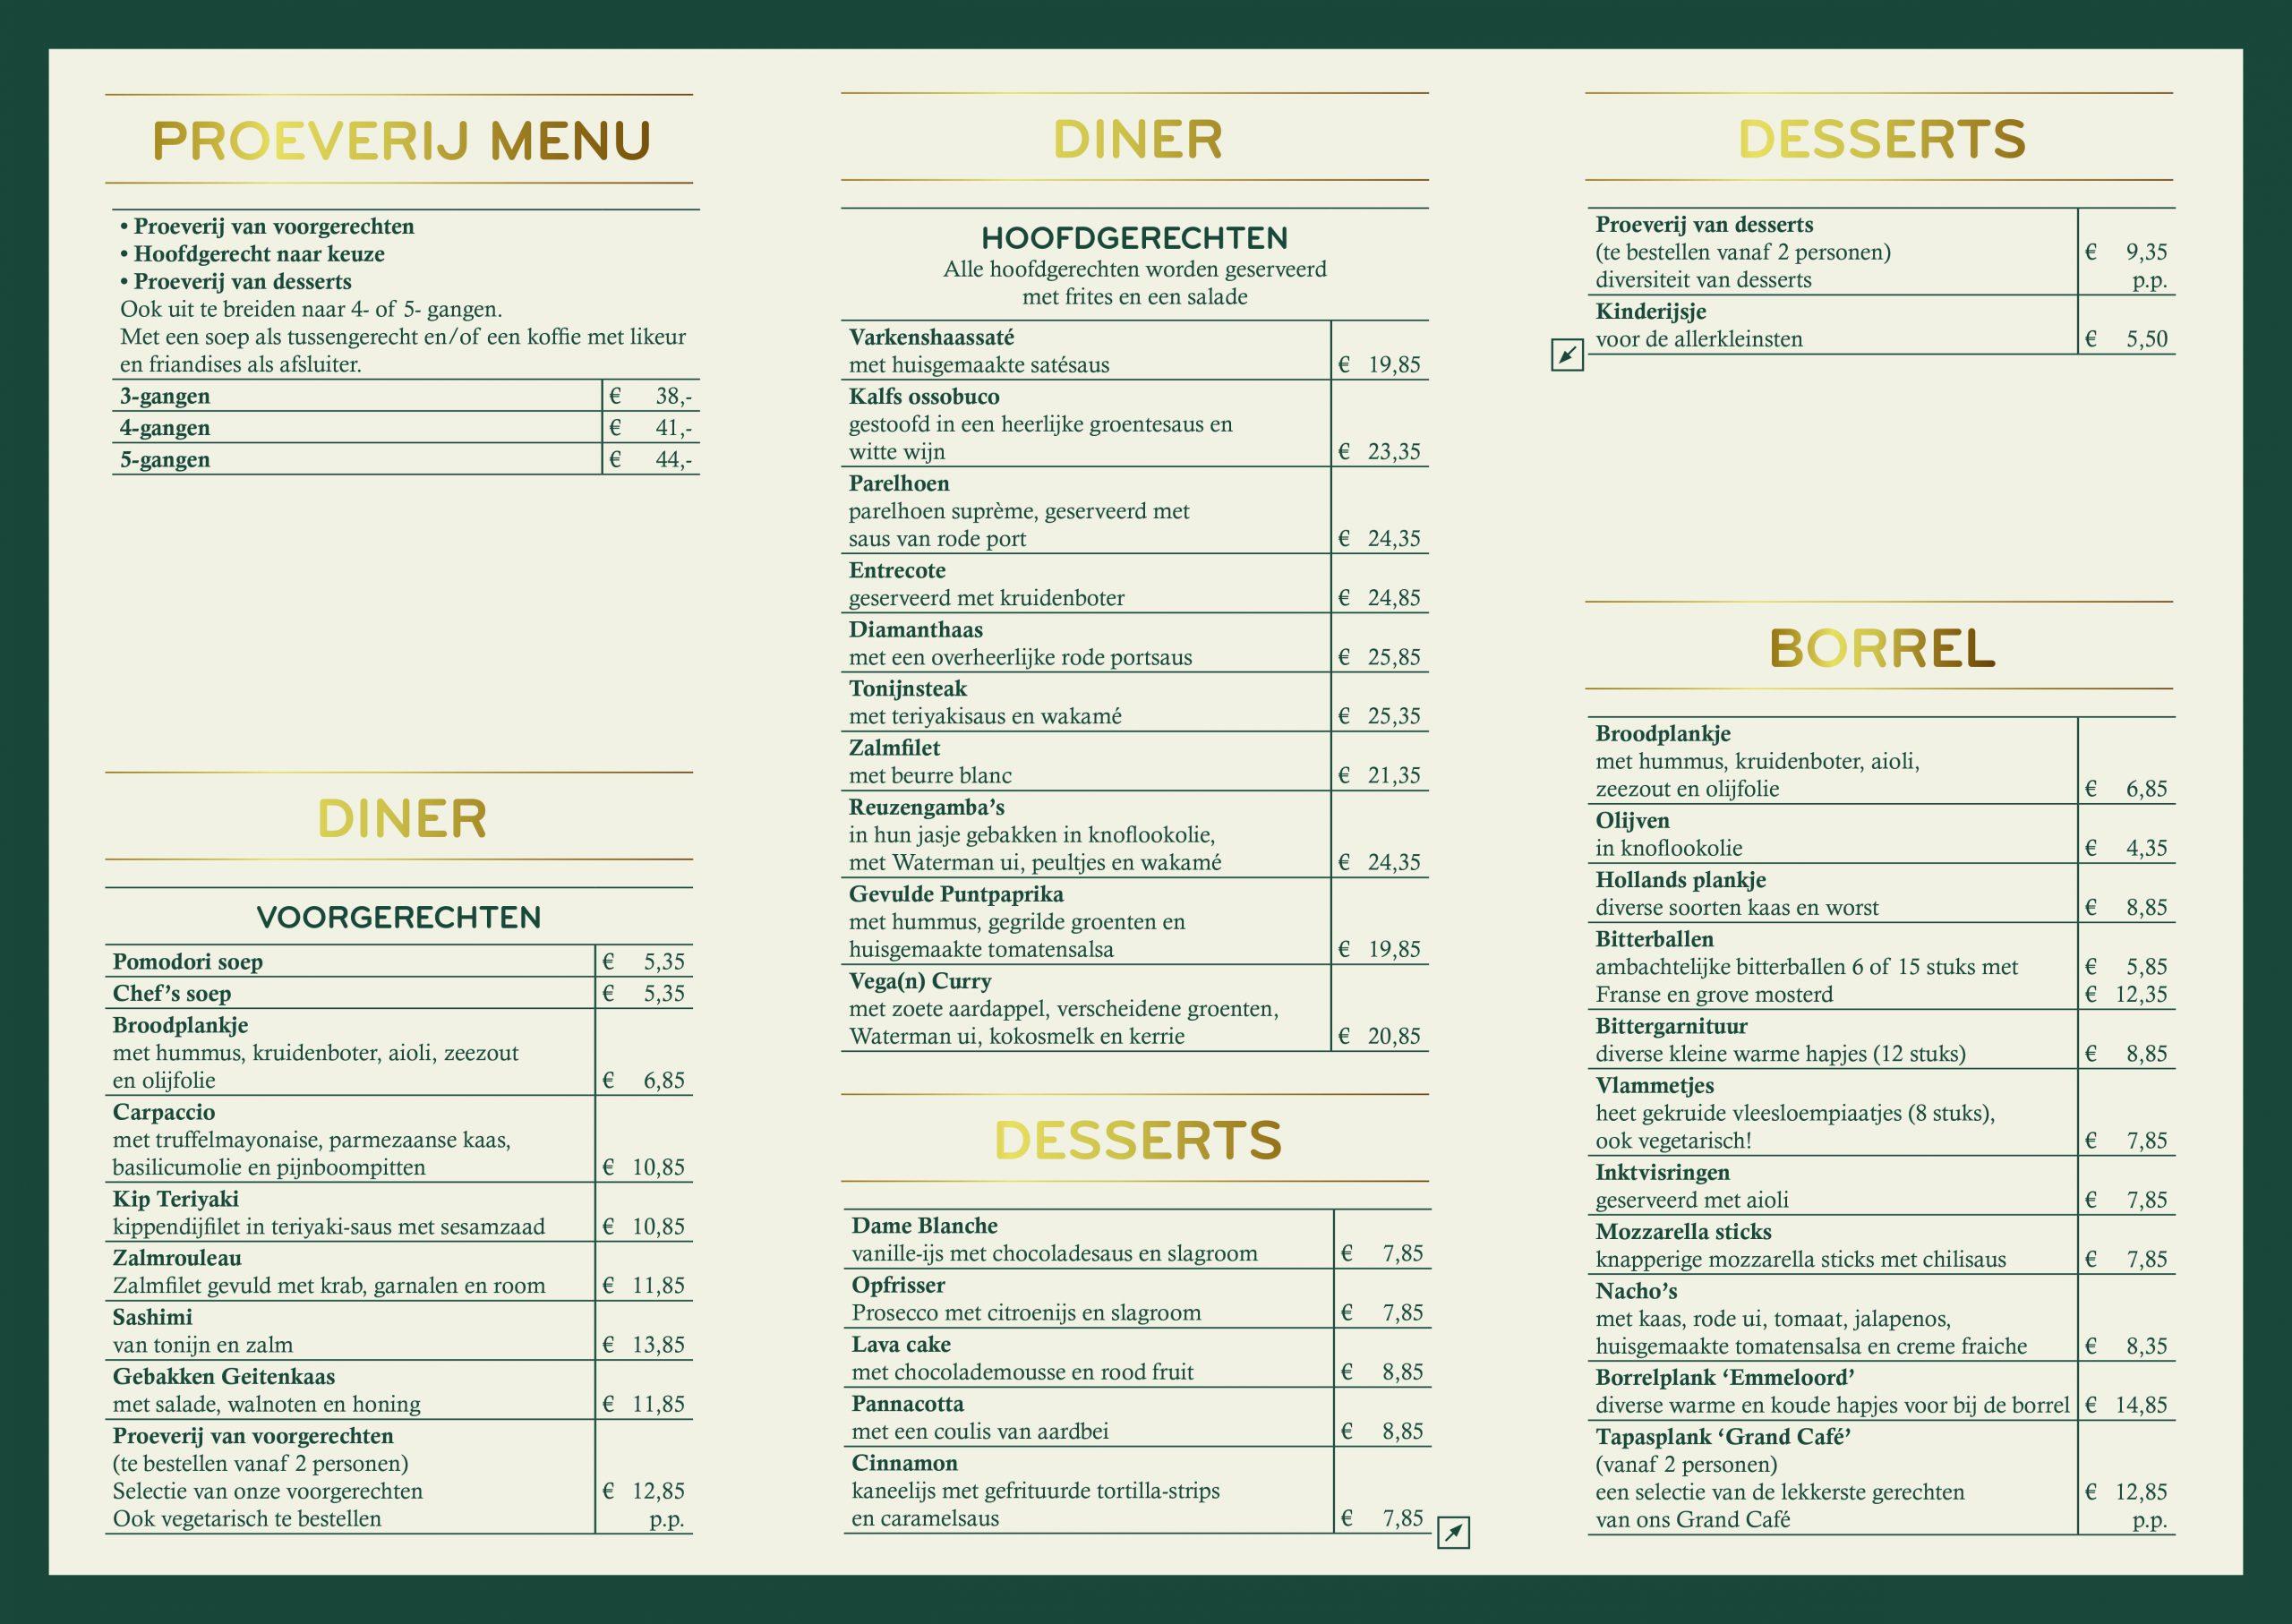 Grand Cafe emmeloord menukaart 2